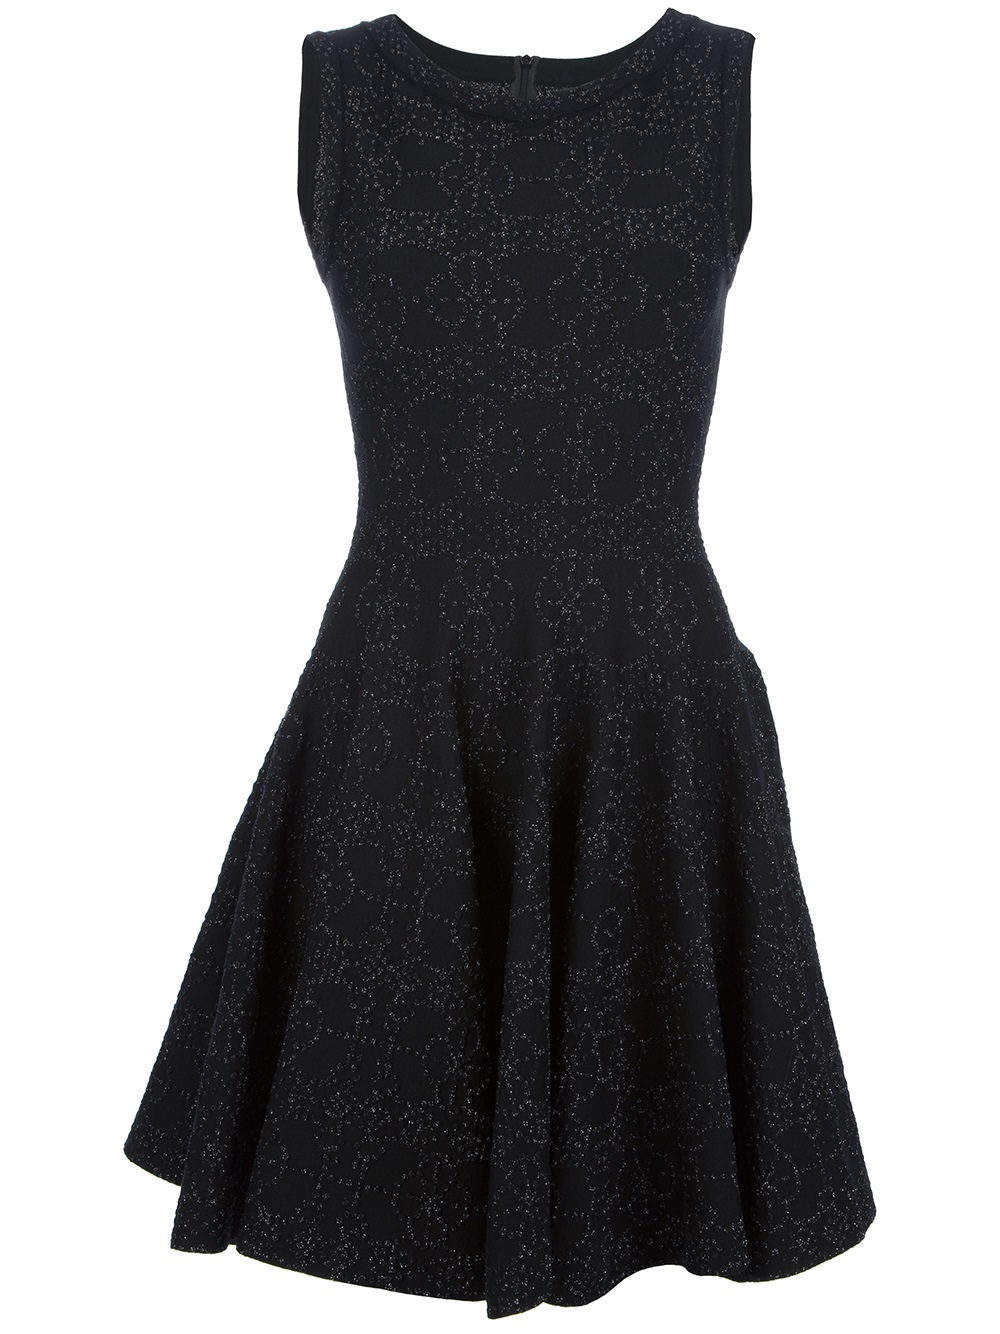 2a669fb583 Alaïa Arabesque Dress in Black - Lyst